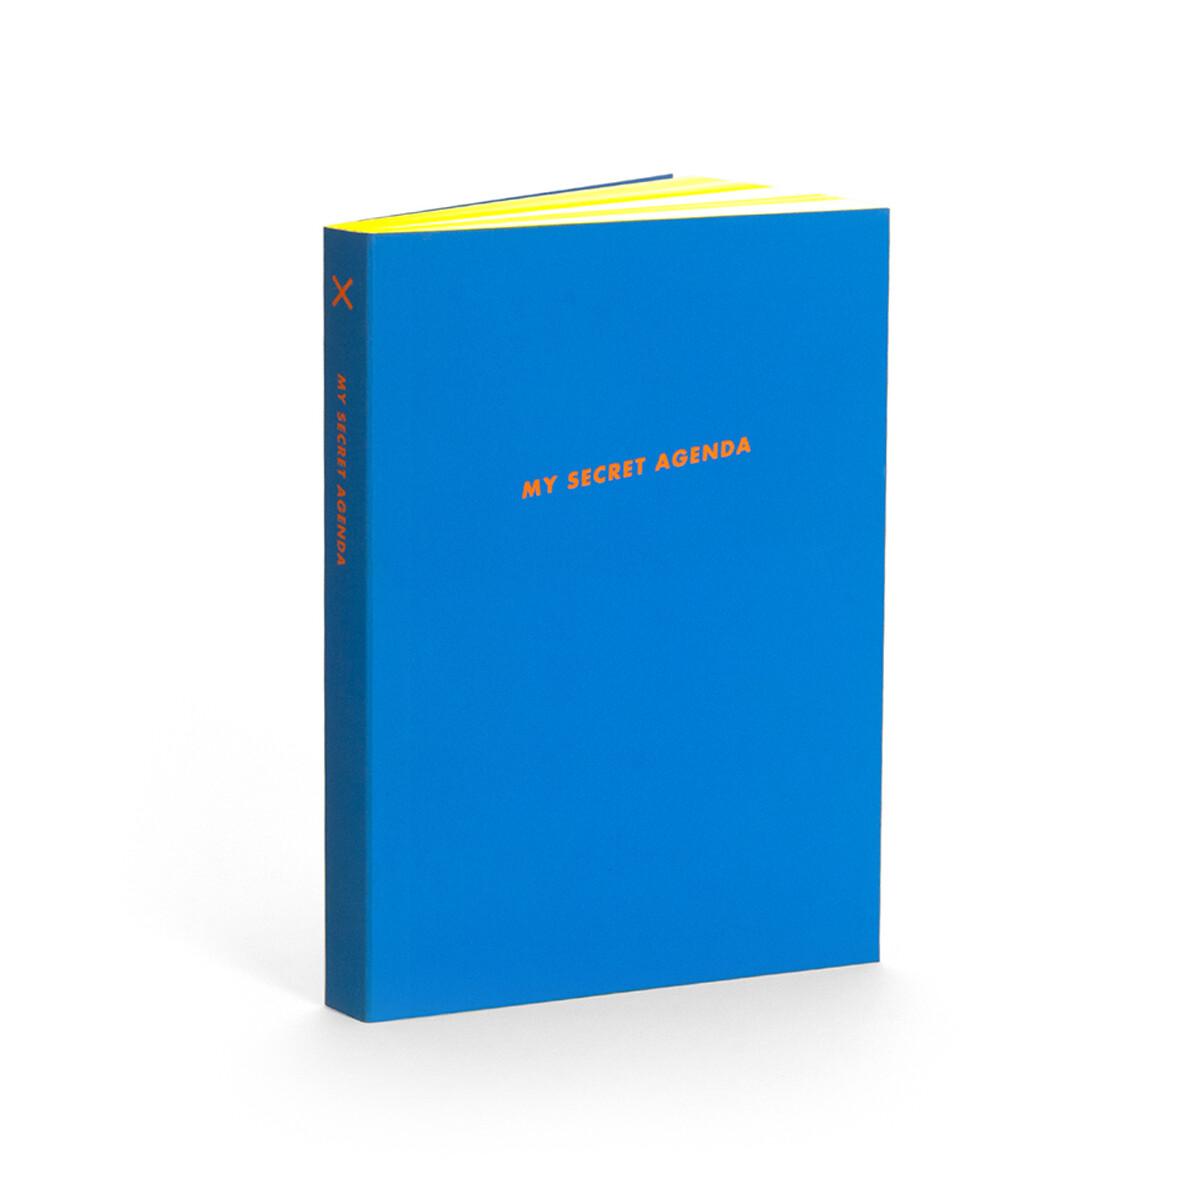 SALE: My Secret Agenda Journal - Seltzer - org. $14.99